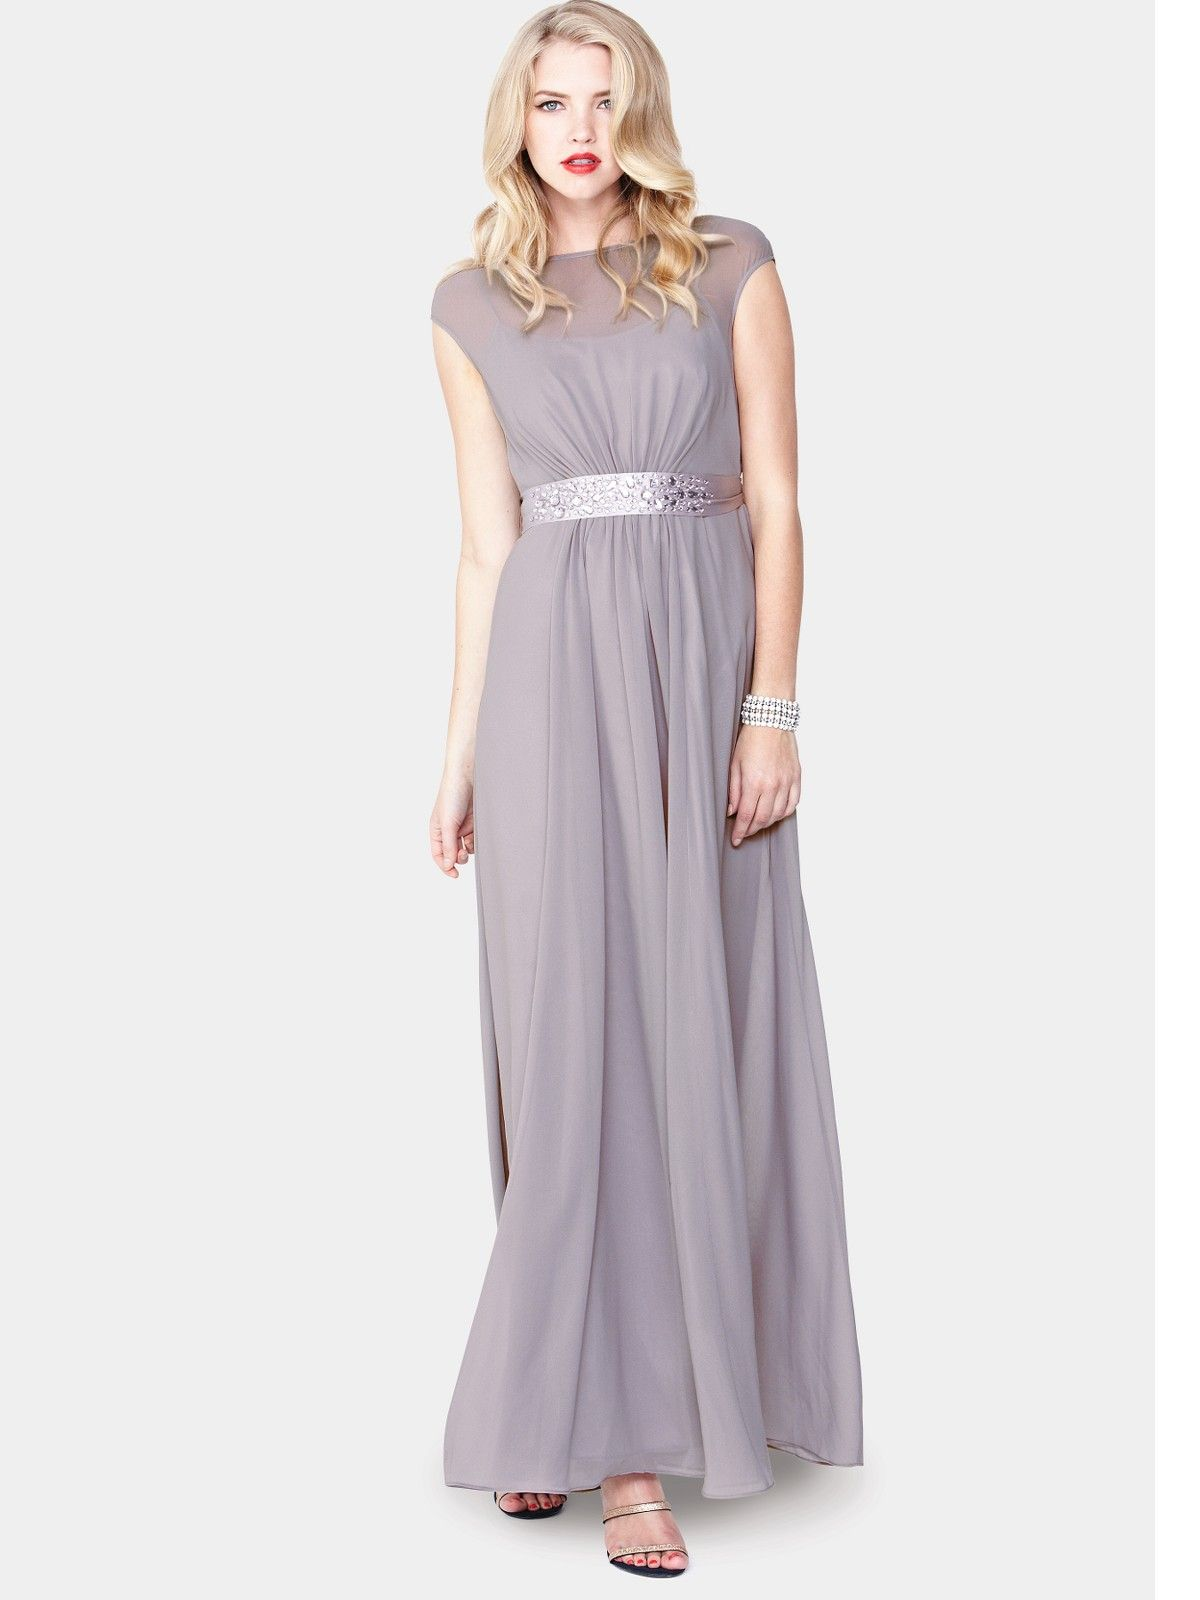 Bridesmaids wedding pinterest maxis maxi dresses and dresses bridesmaid ombrellifo Image collections